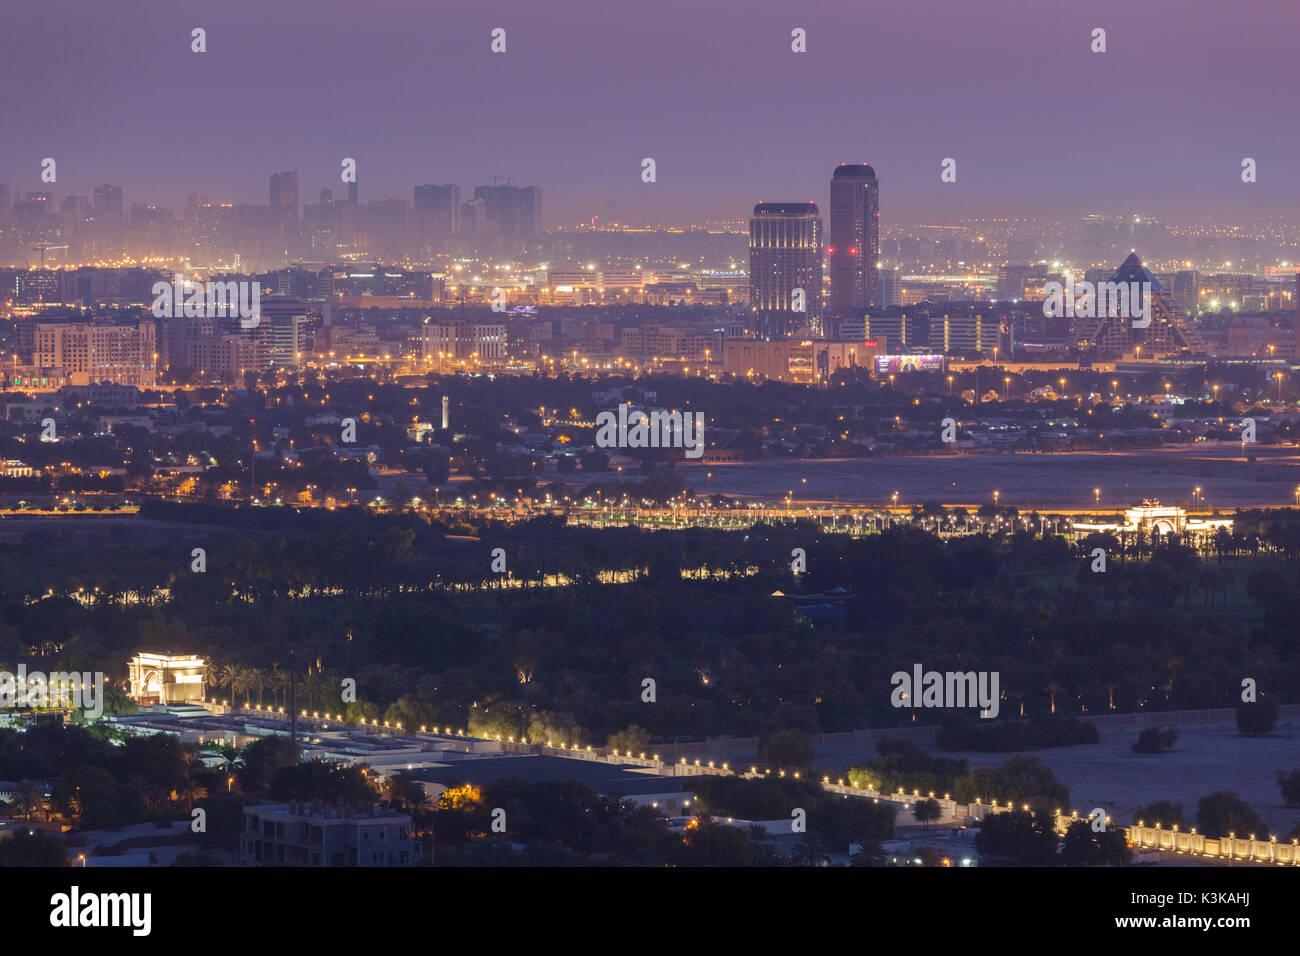 UAE, Dubai, Downtown Dubai, elevated desert and highway view towards Ras Al Khor, dawn - Stock Image